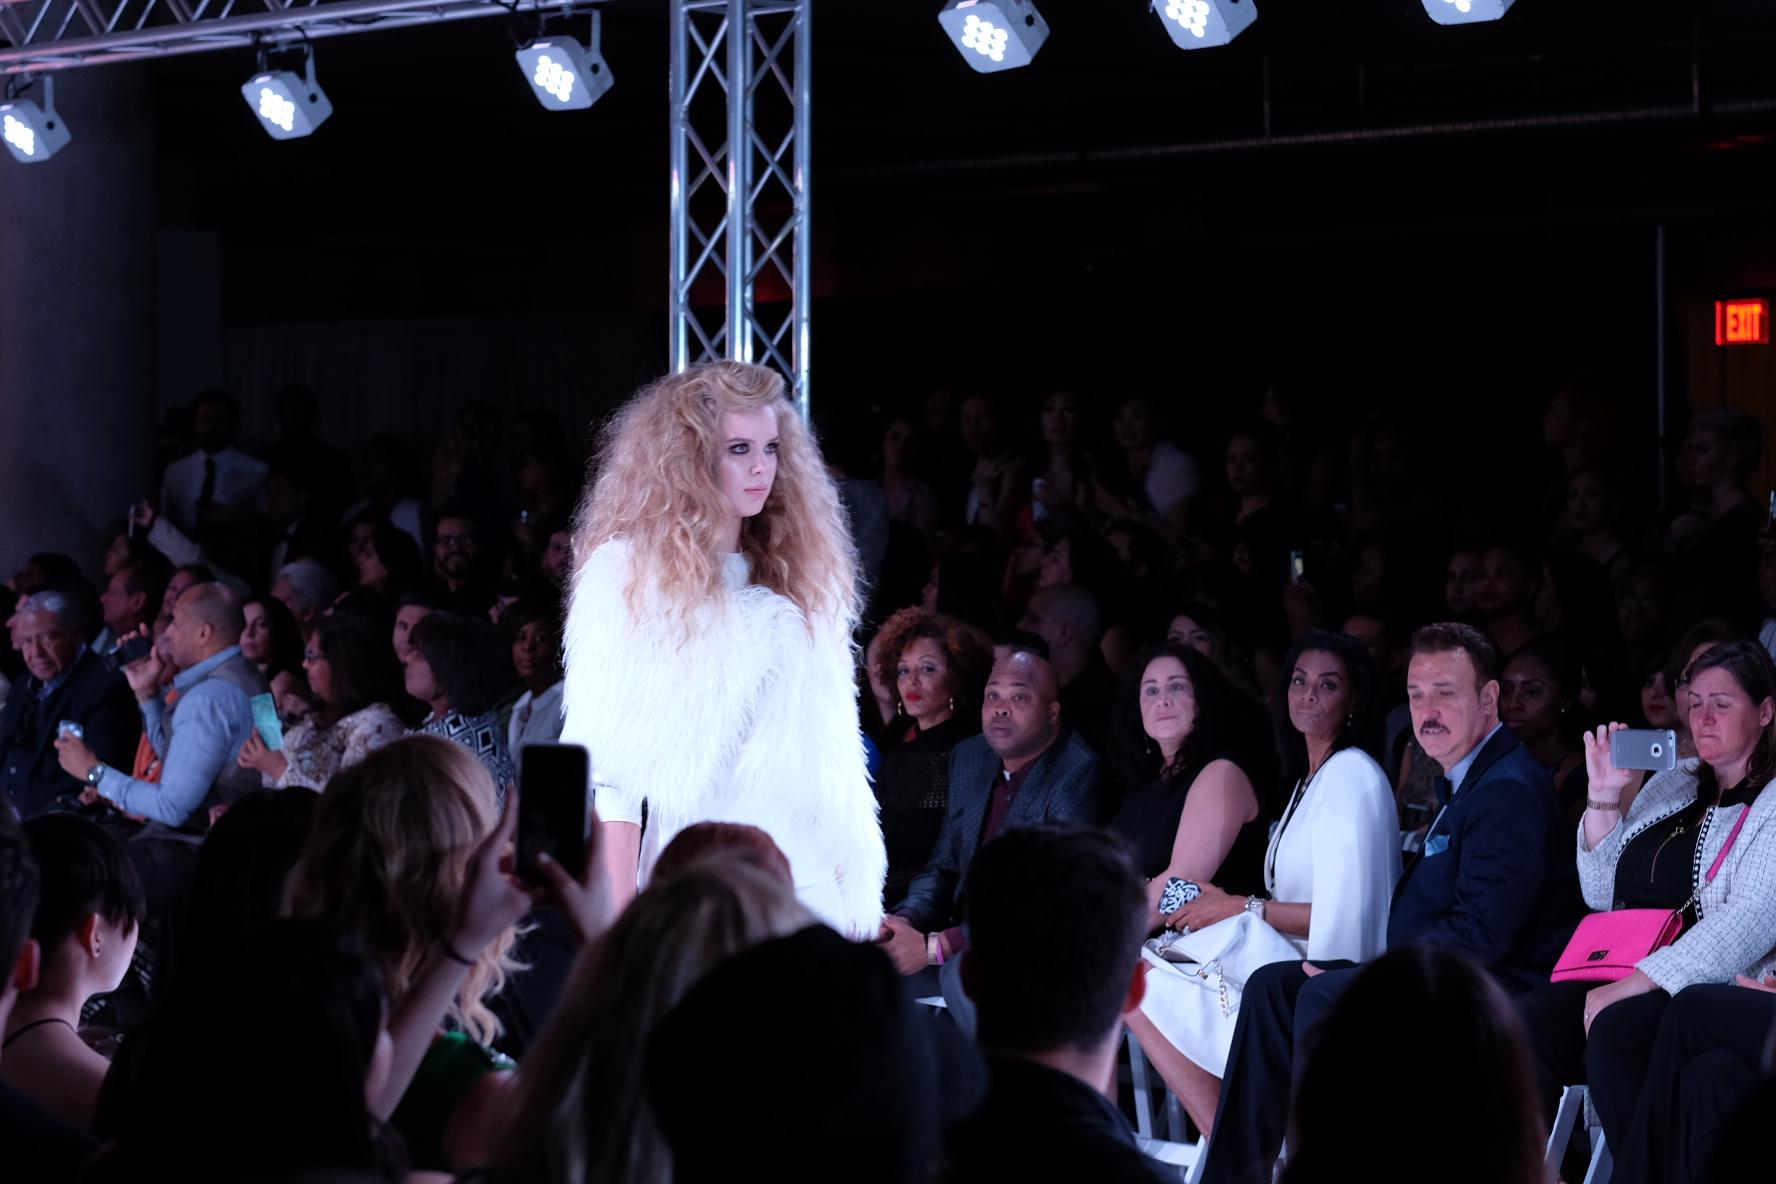 LAFW F/W16 Designer: Dena Burton Lead Hair: Luxelab Editorial Director Jen Beckerman Photo: Liz Abrams